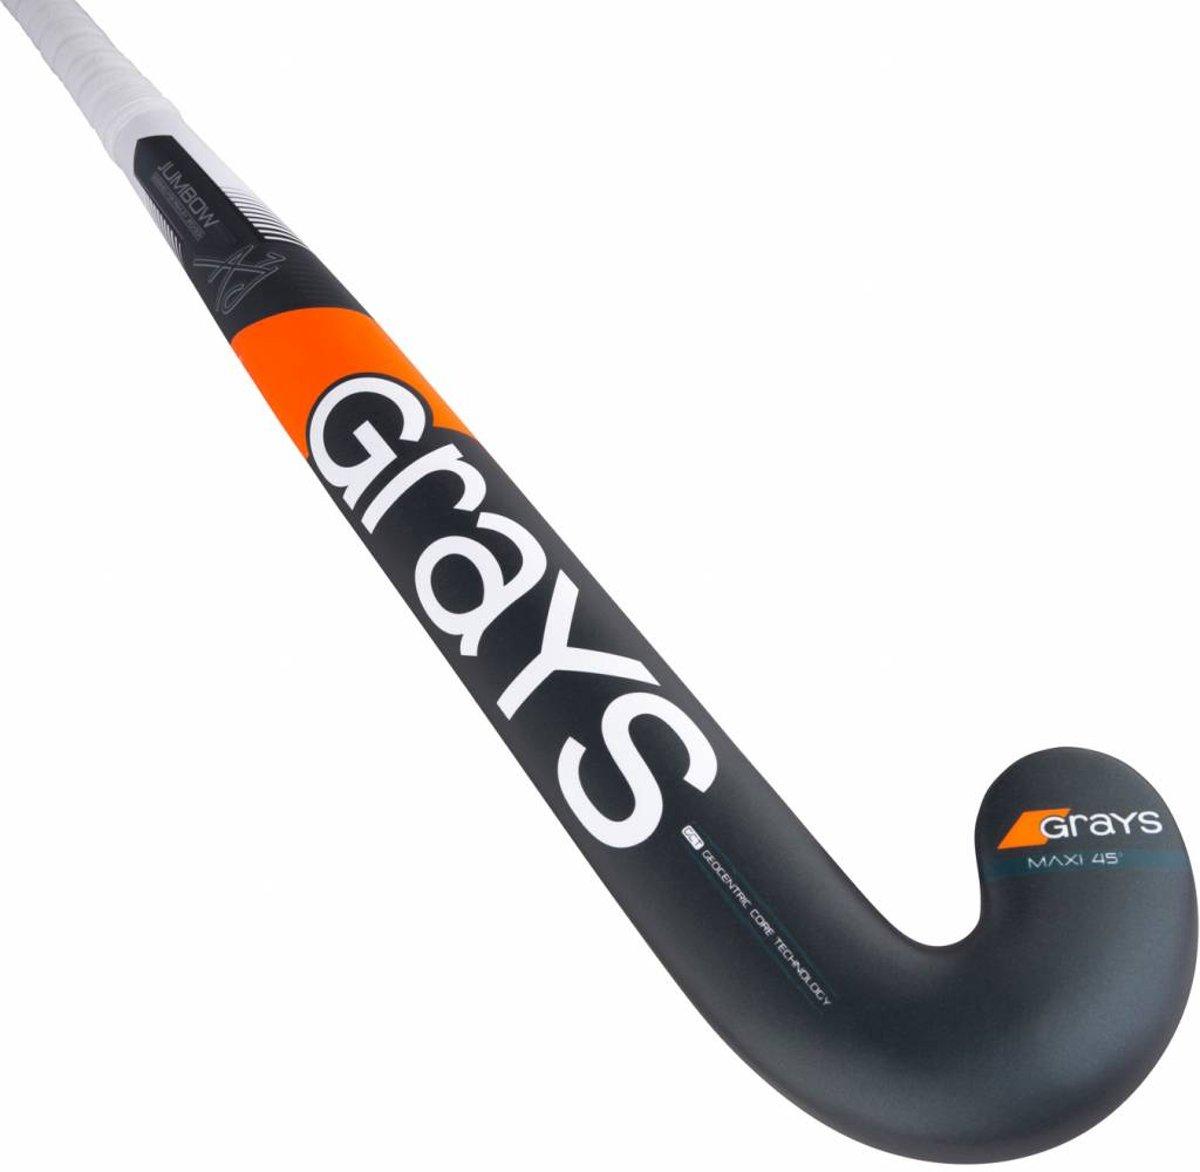 Hockeystick KN AJ7 Jumbow Maxi kopen